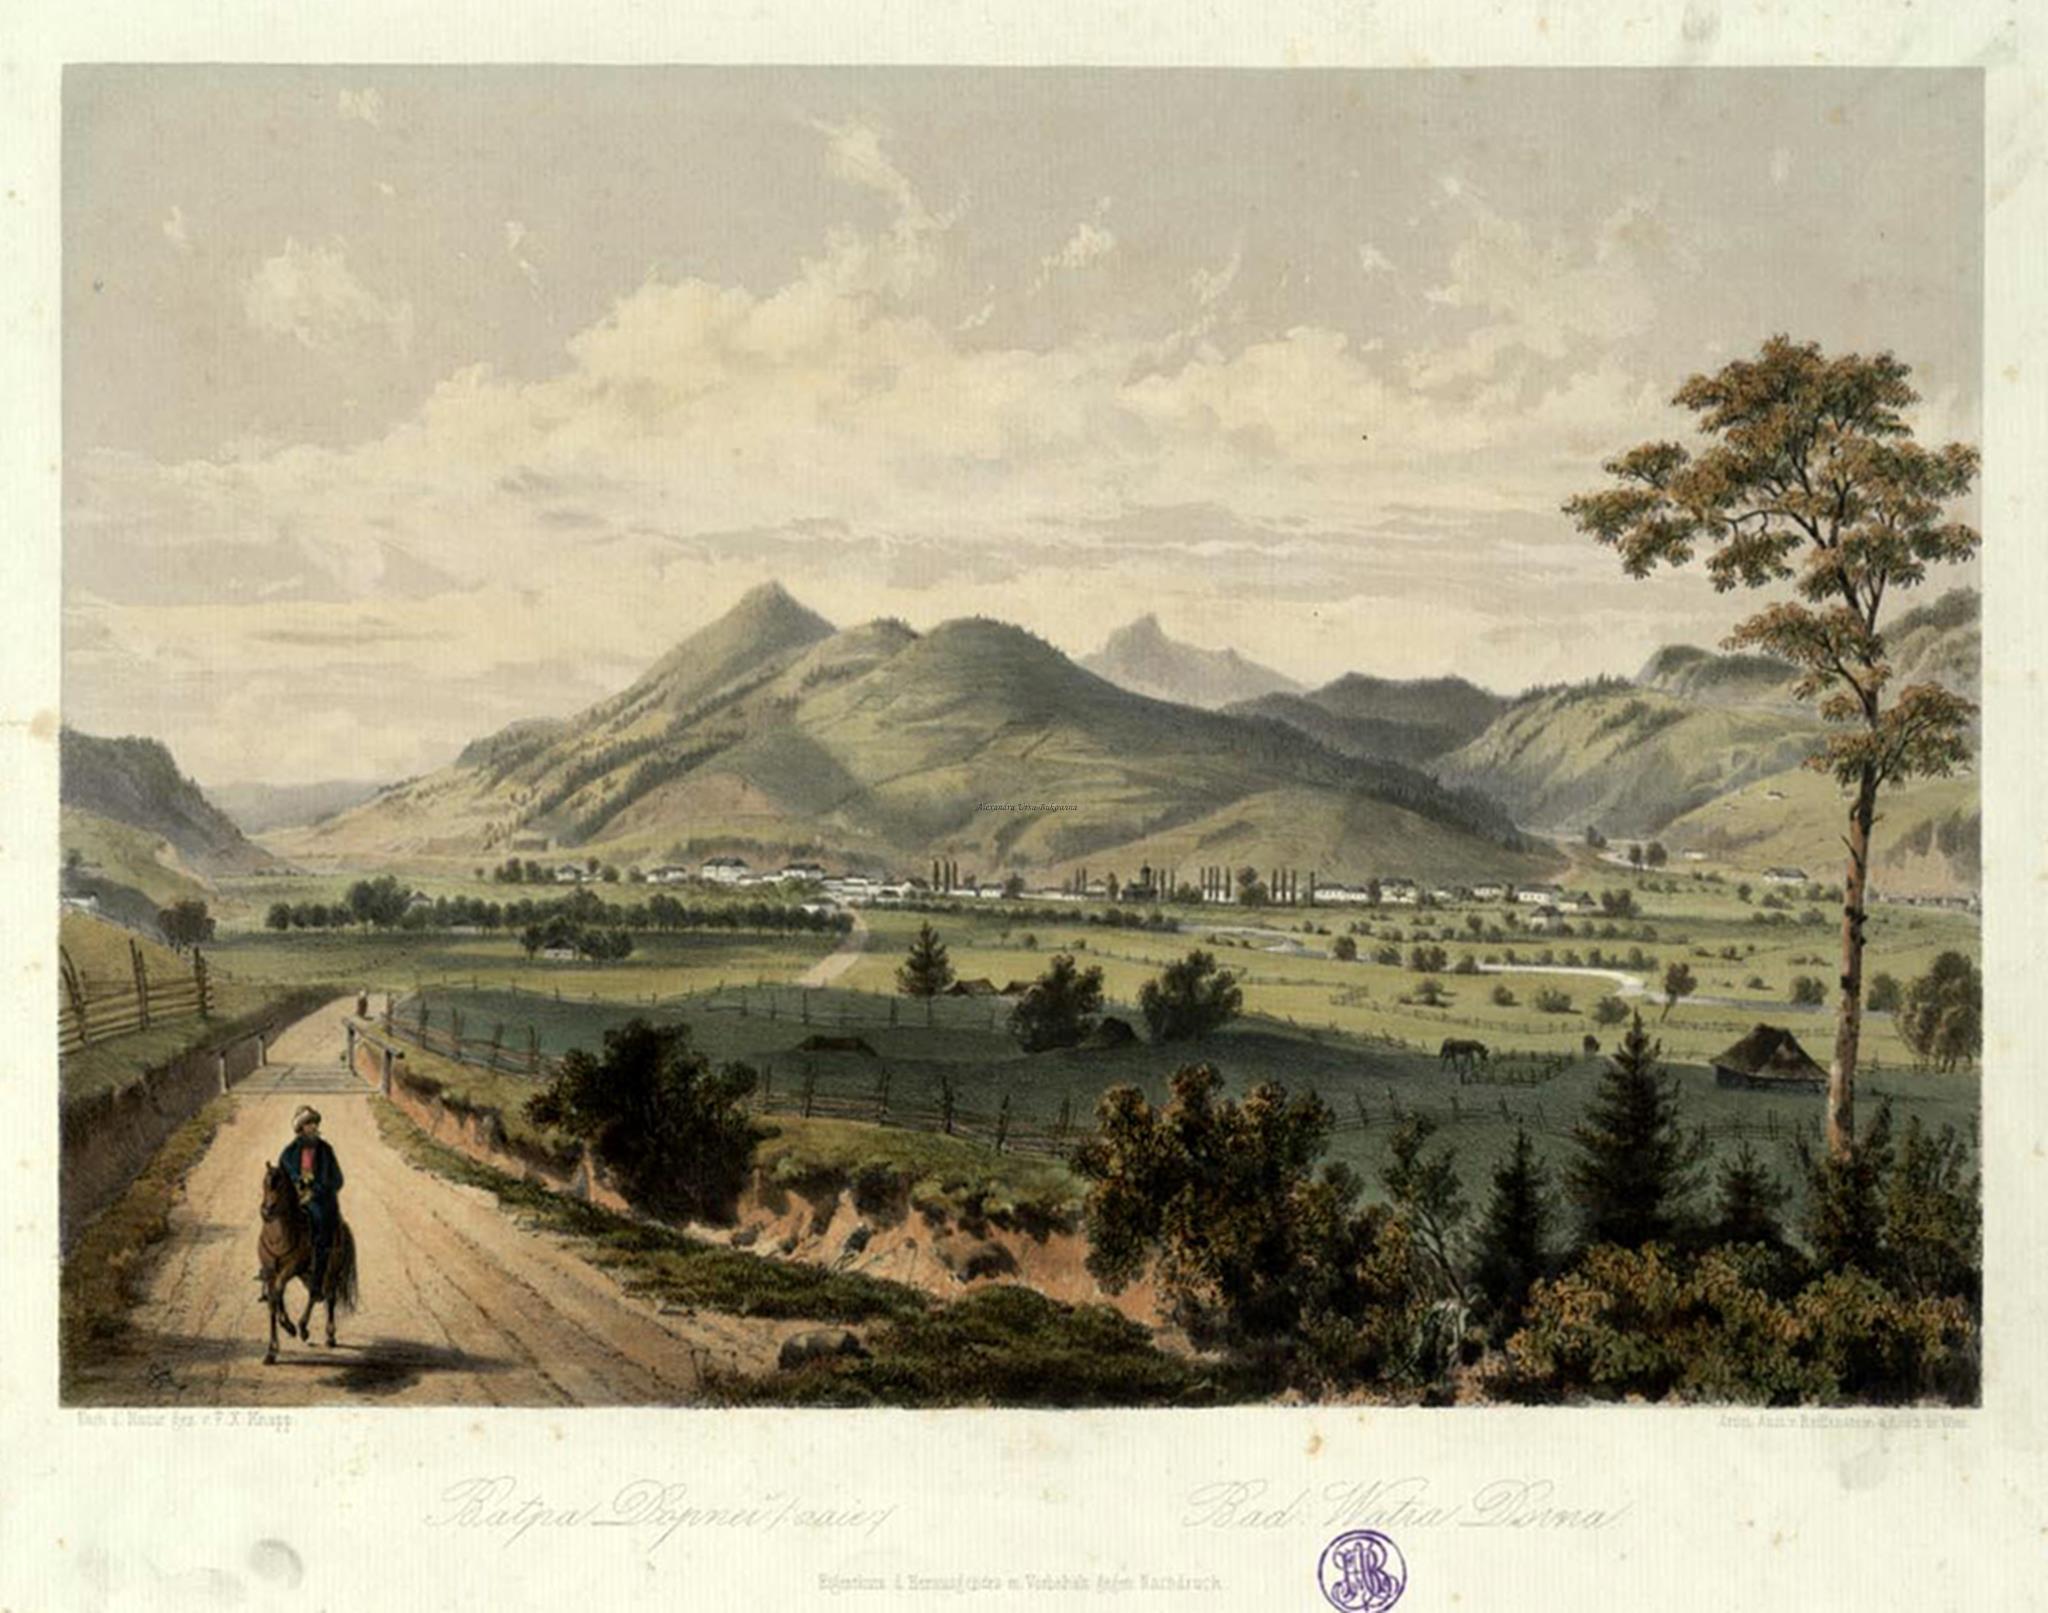 Oameni si locuri din Bucovina. Vatra Dornei baie.Bad Watra Dornei. 1870. F. X. Knapp